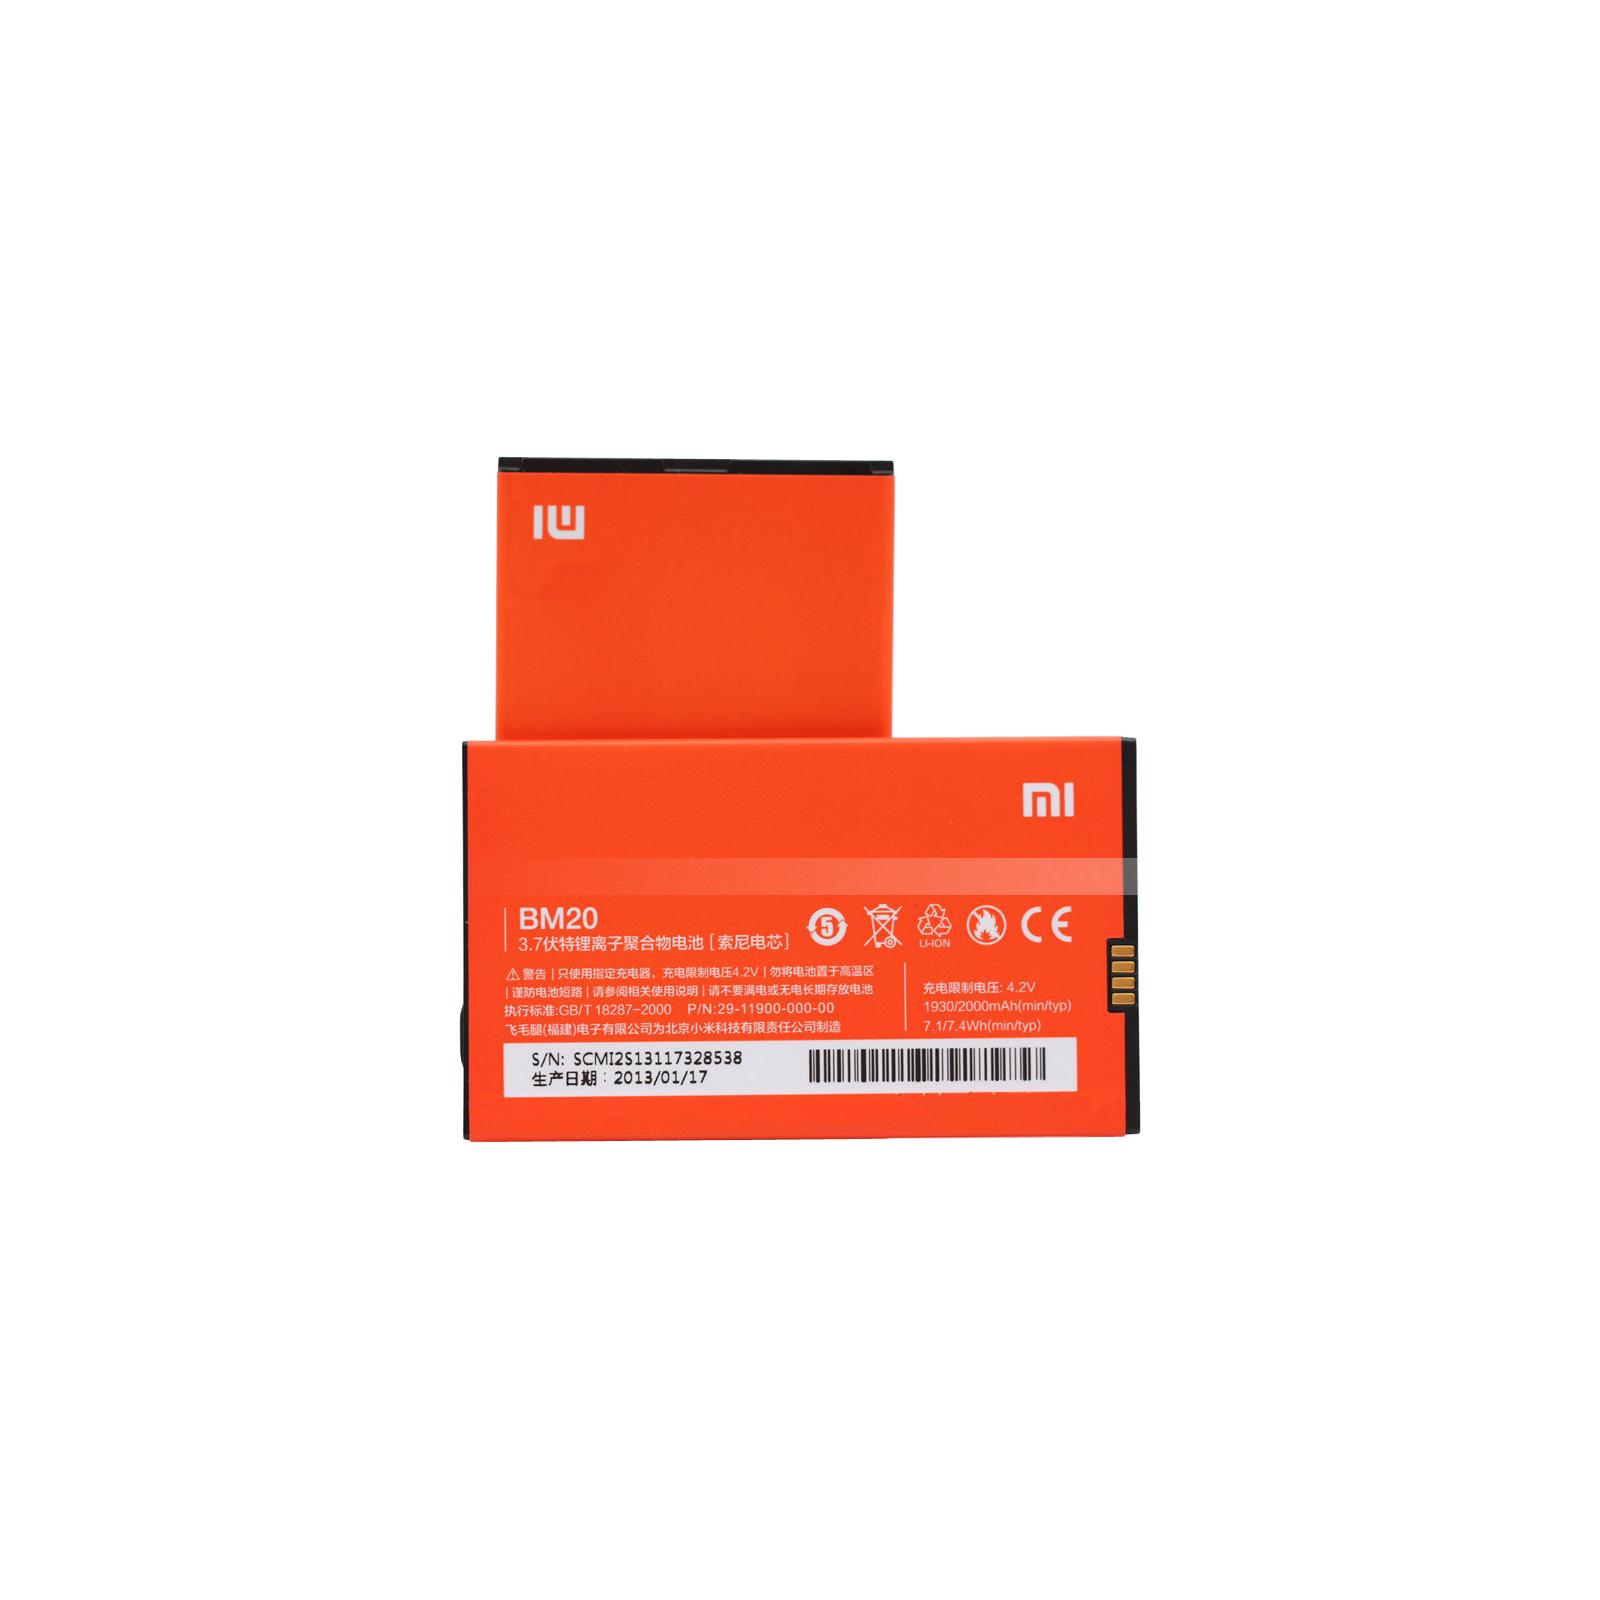 Аккумуляторная батарея Xiaomi for Mi2/Mi2s/M2 (BM20 / 39245)